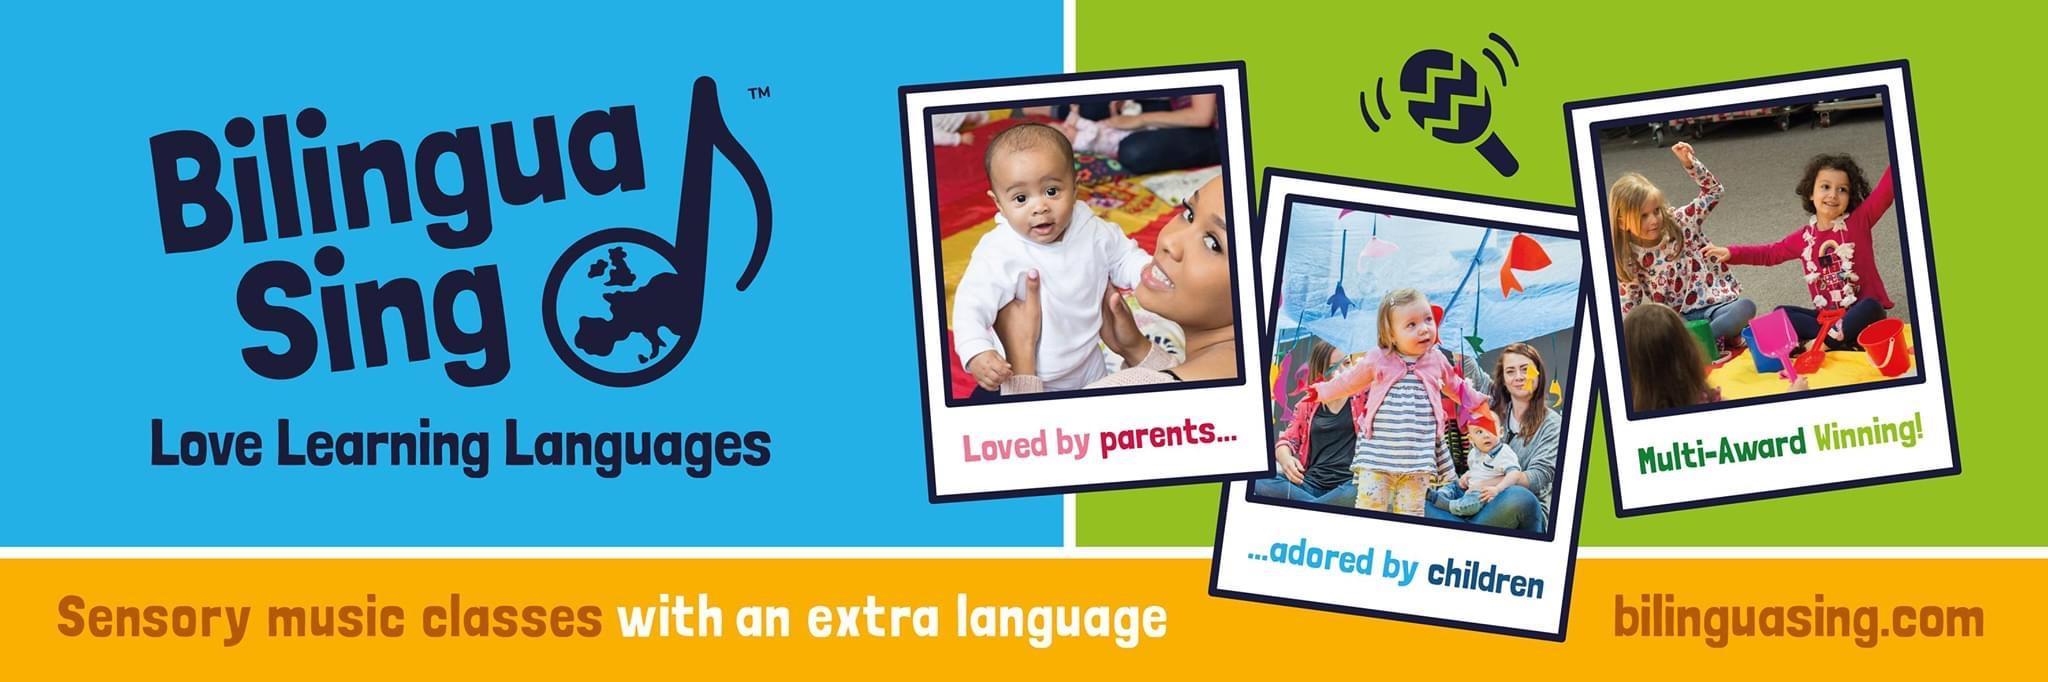 BilinguaSing Coventry & Warwickshire's main image